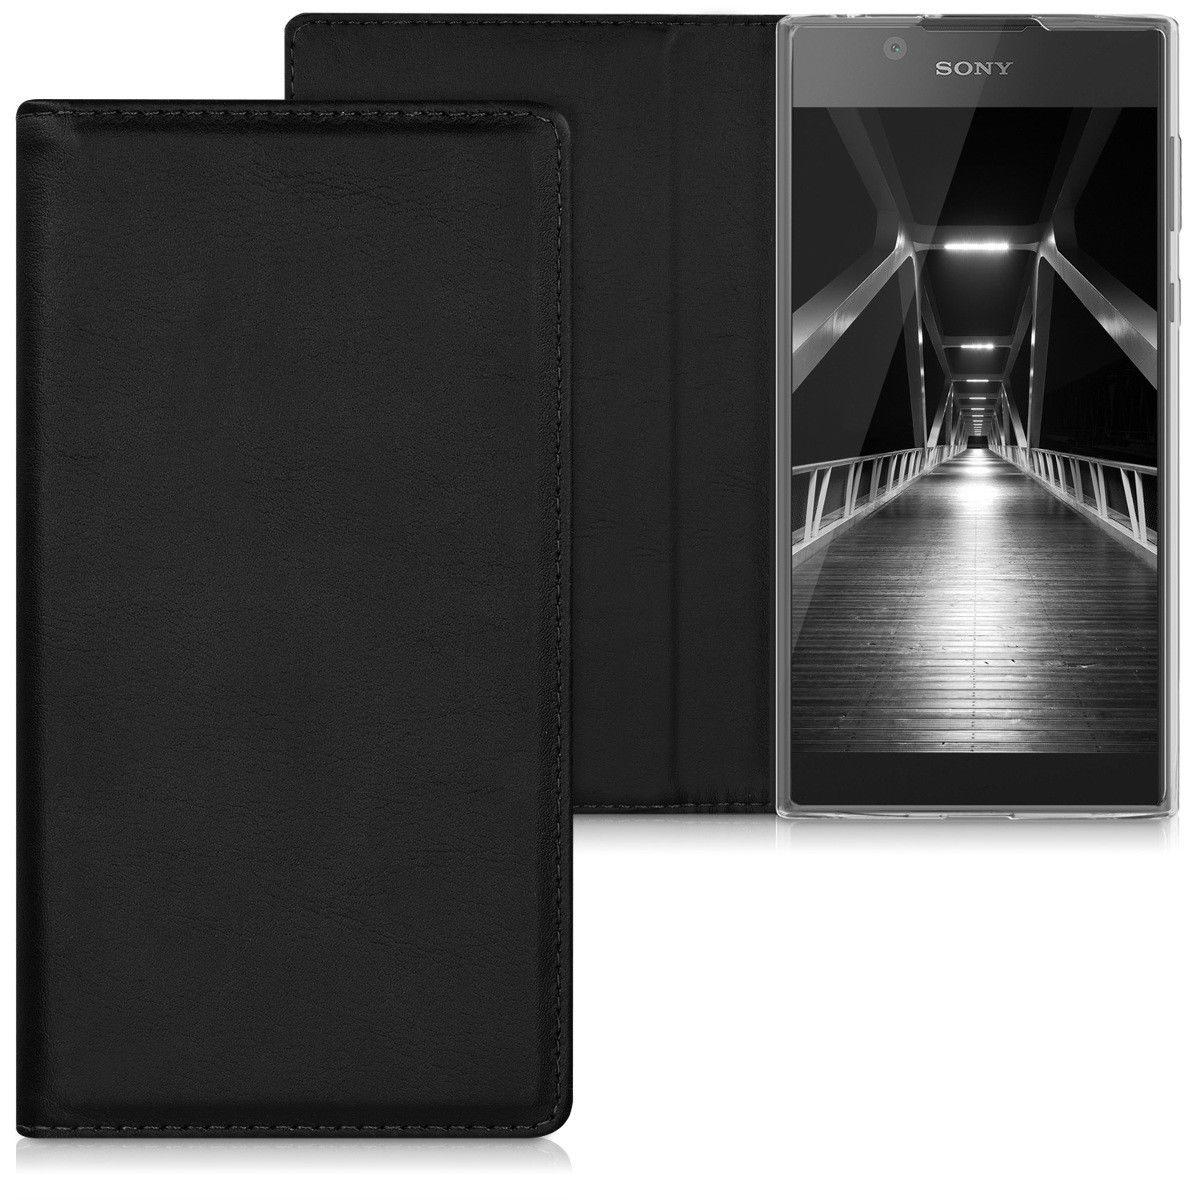 Pouzdro FLIP pro Sony Xperia L1 černé